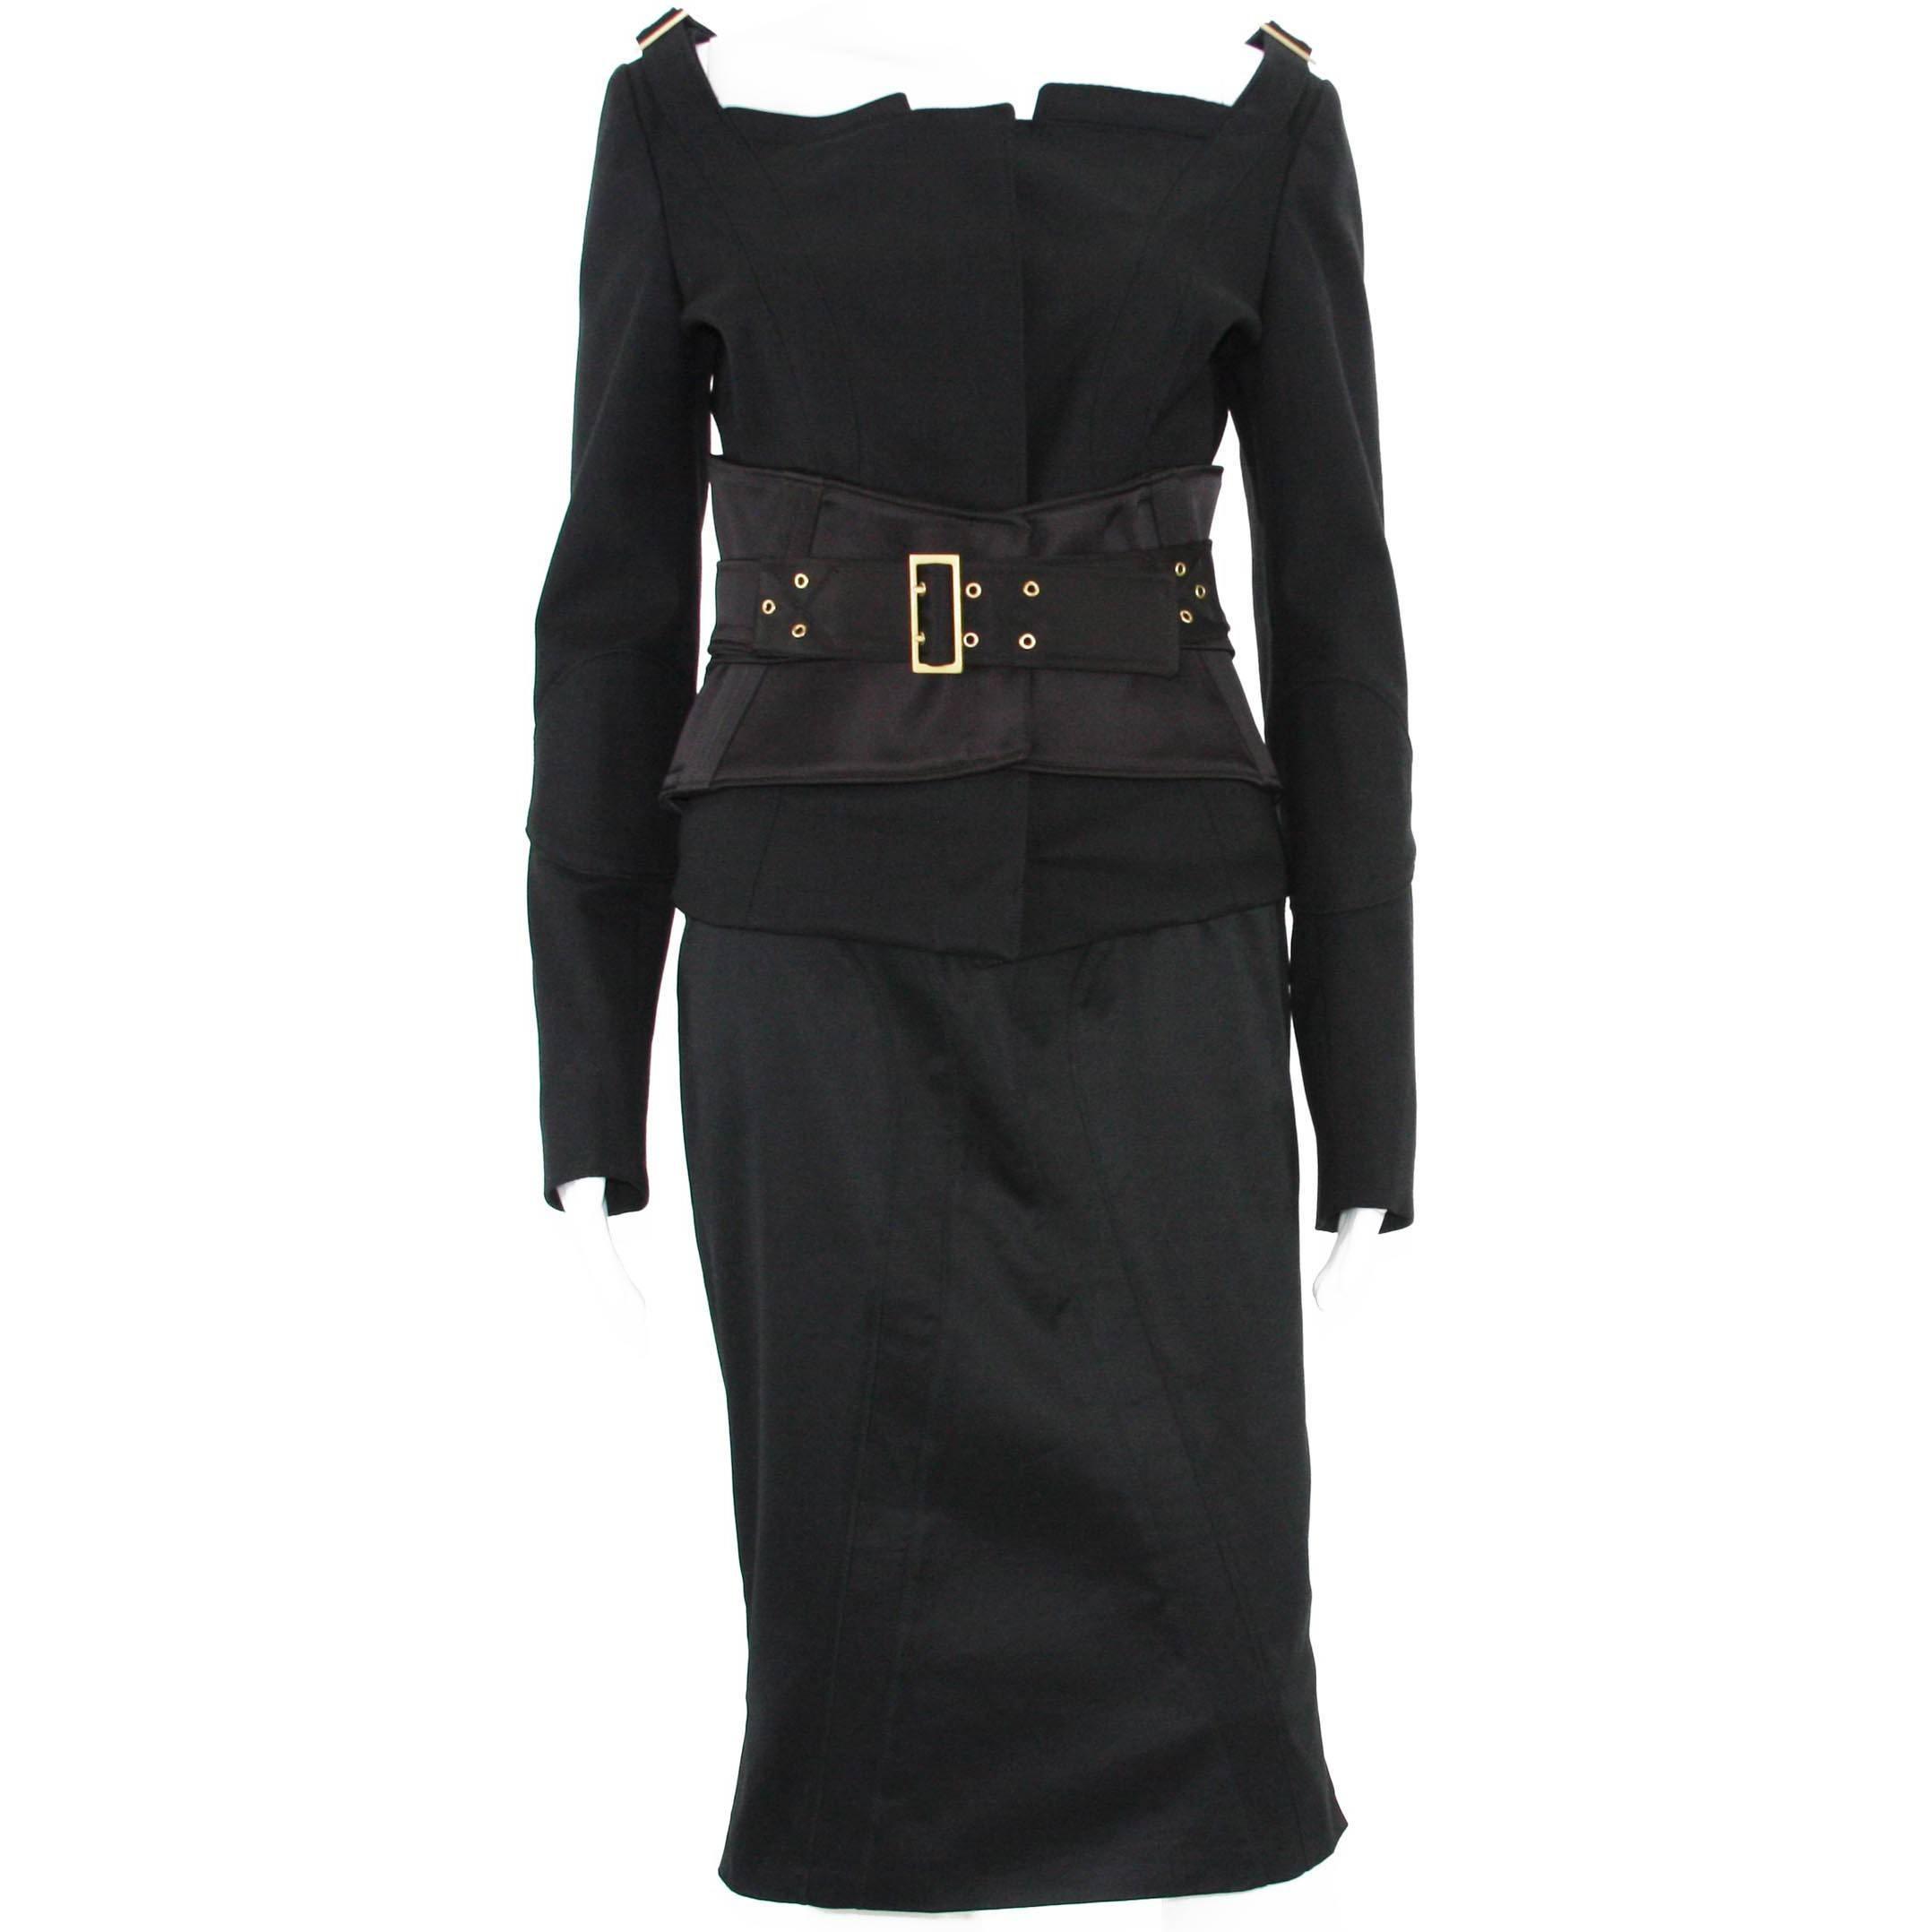 TOM FORD for GUCCI F/W 2003 Black Jacket + Skirt + Belt SUIT It. 44 - US 8